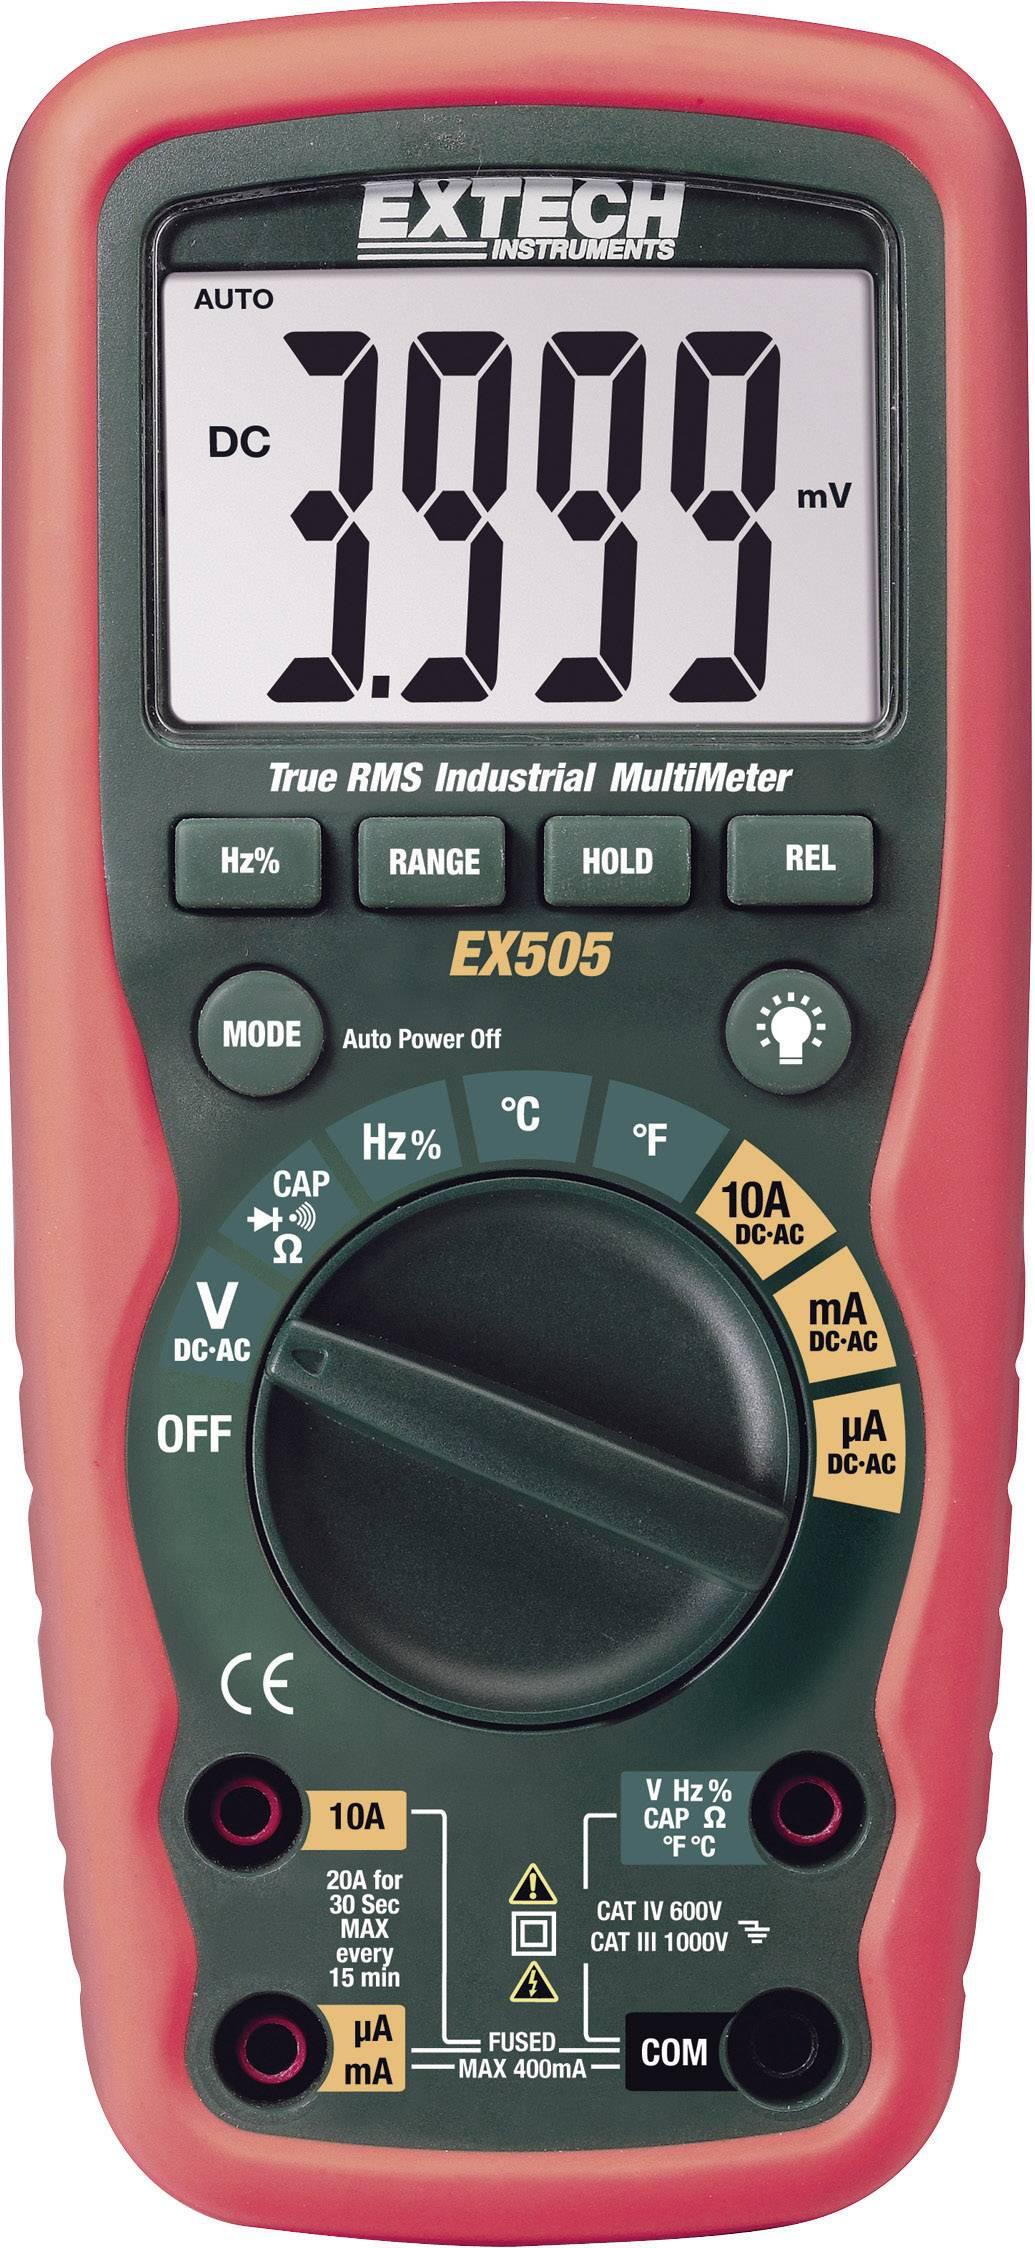 Digitálne/y ručný multimeter Extech EX505 EX505, vodotesné (IP67)